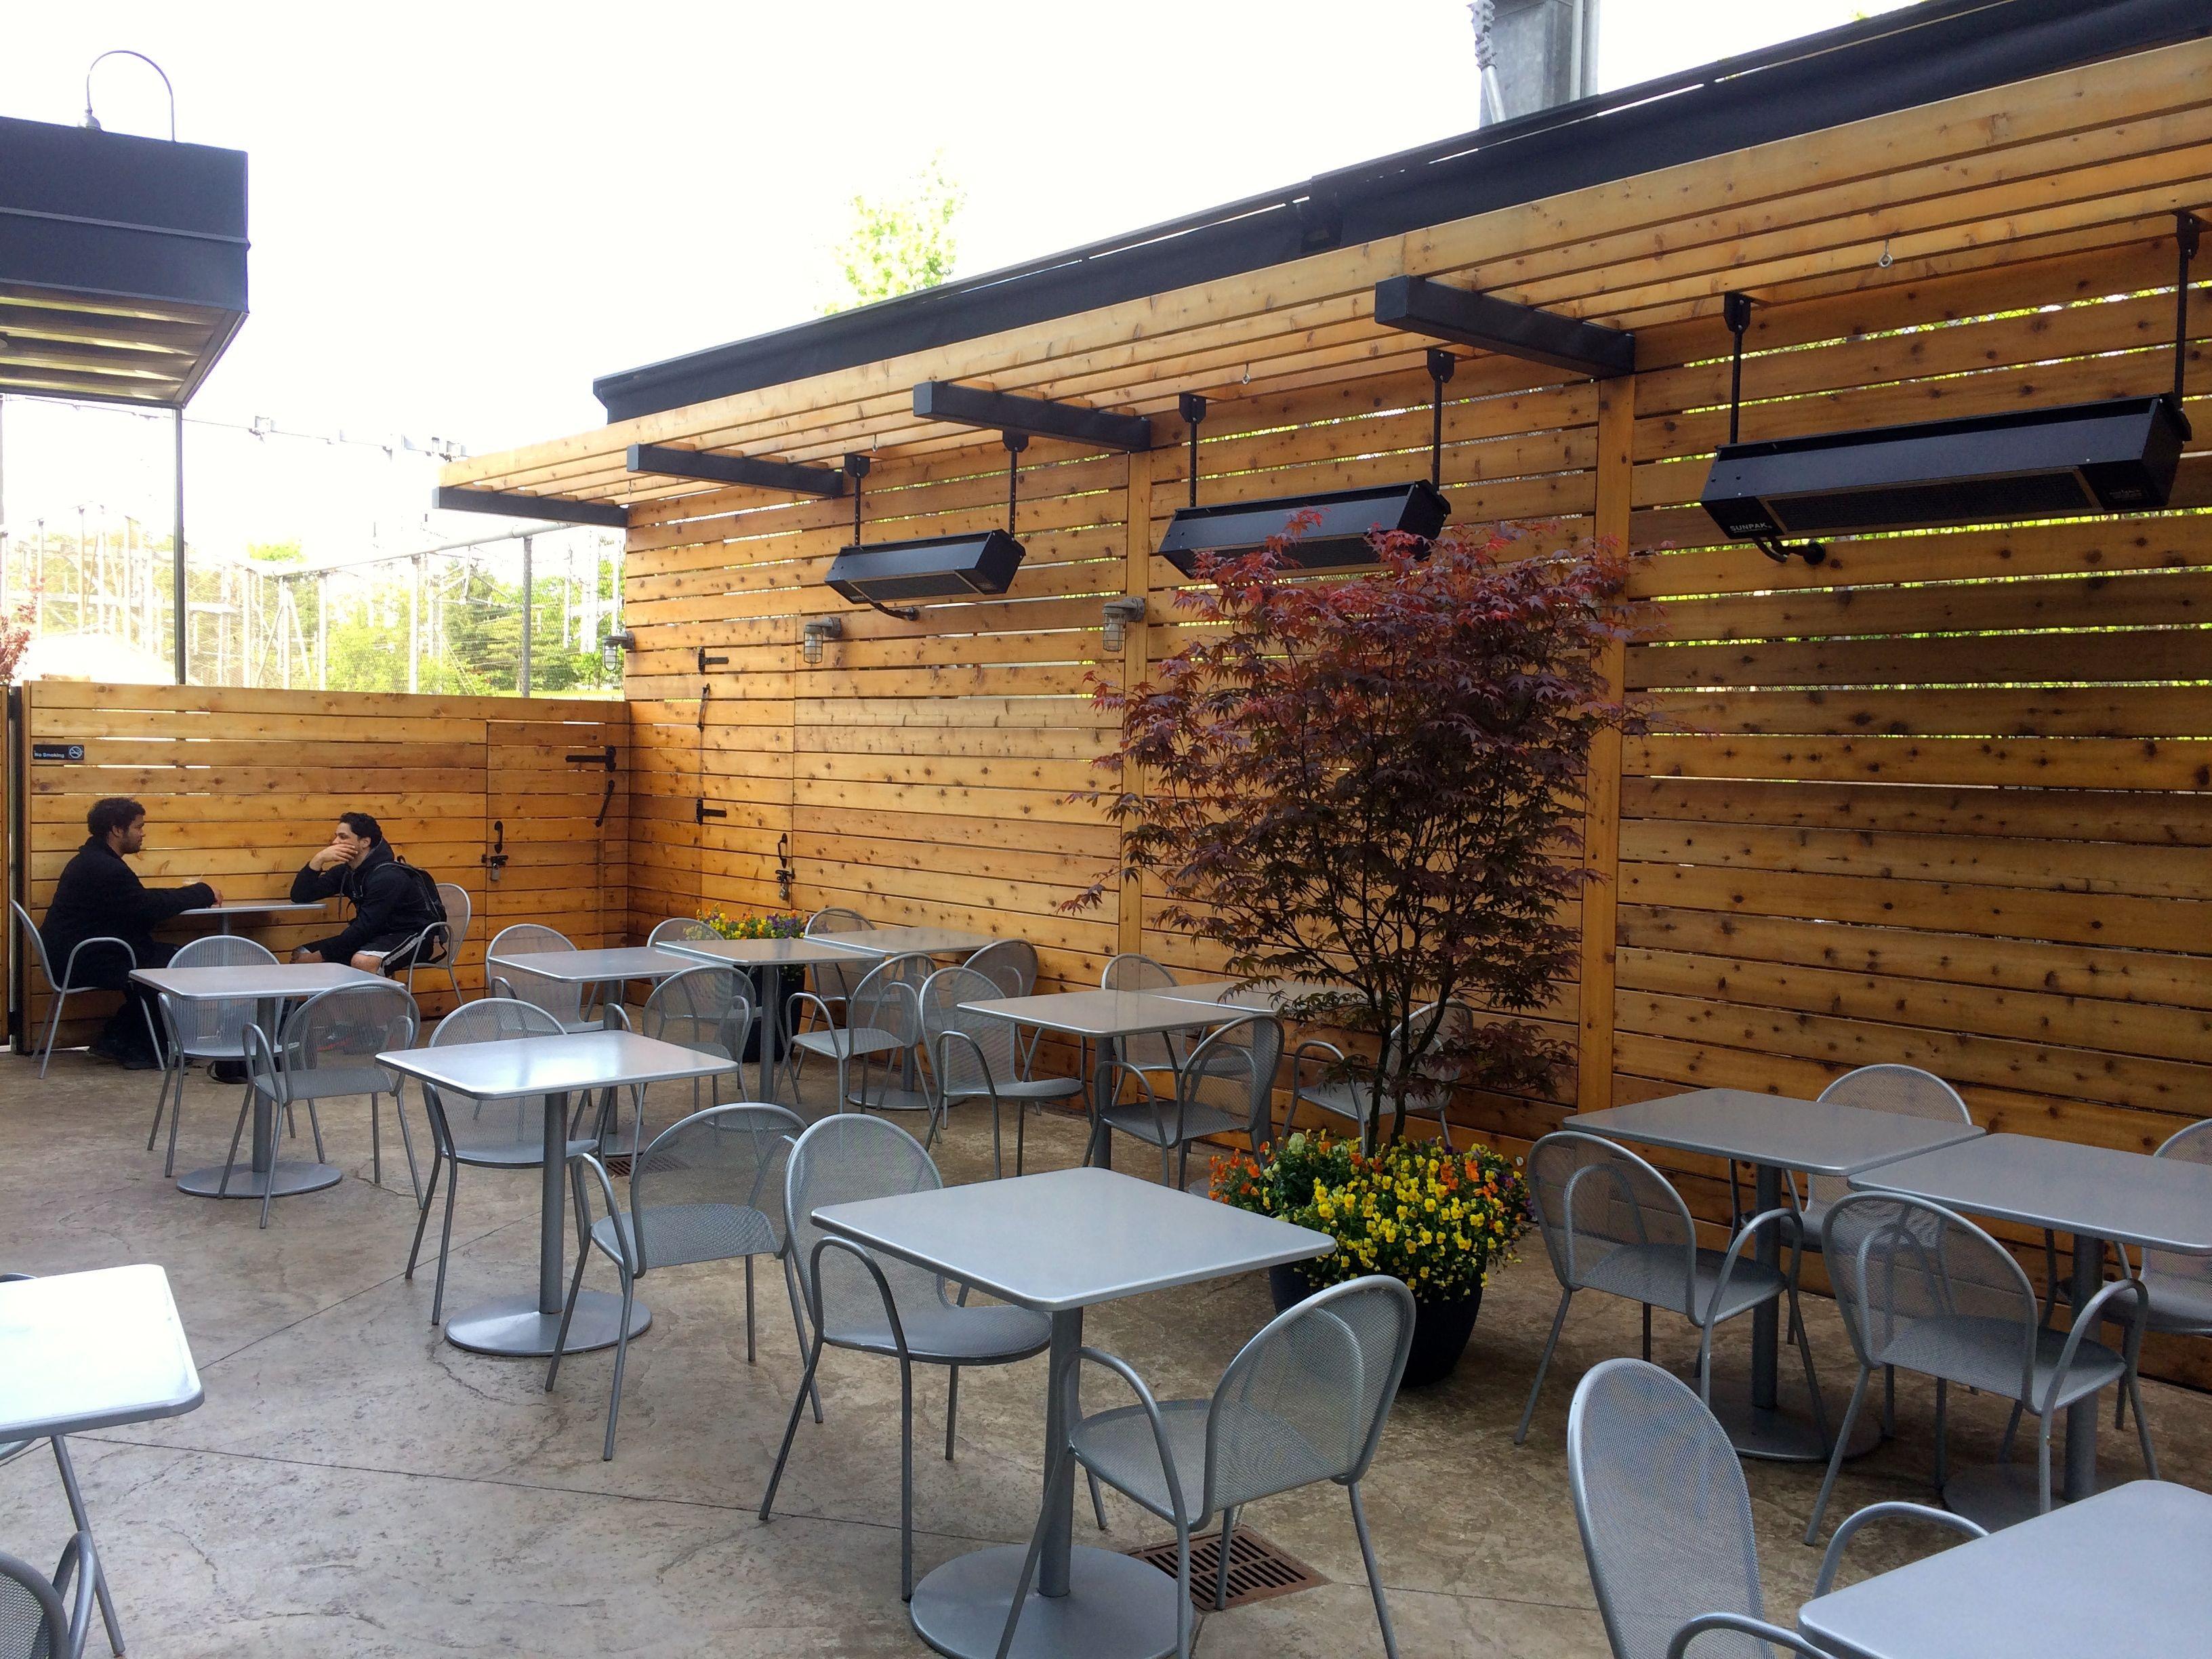 Gallery Restaurant Patios of Jamaica Plain  Jamaica Plain News